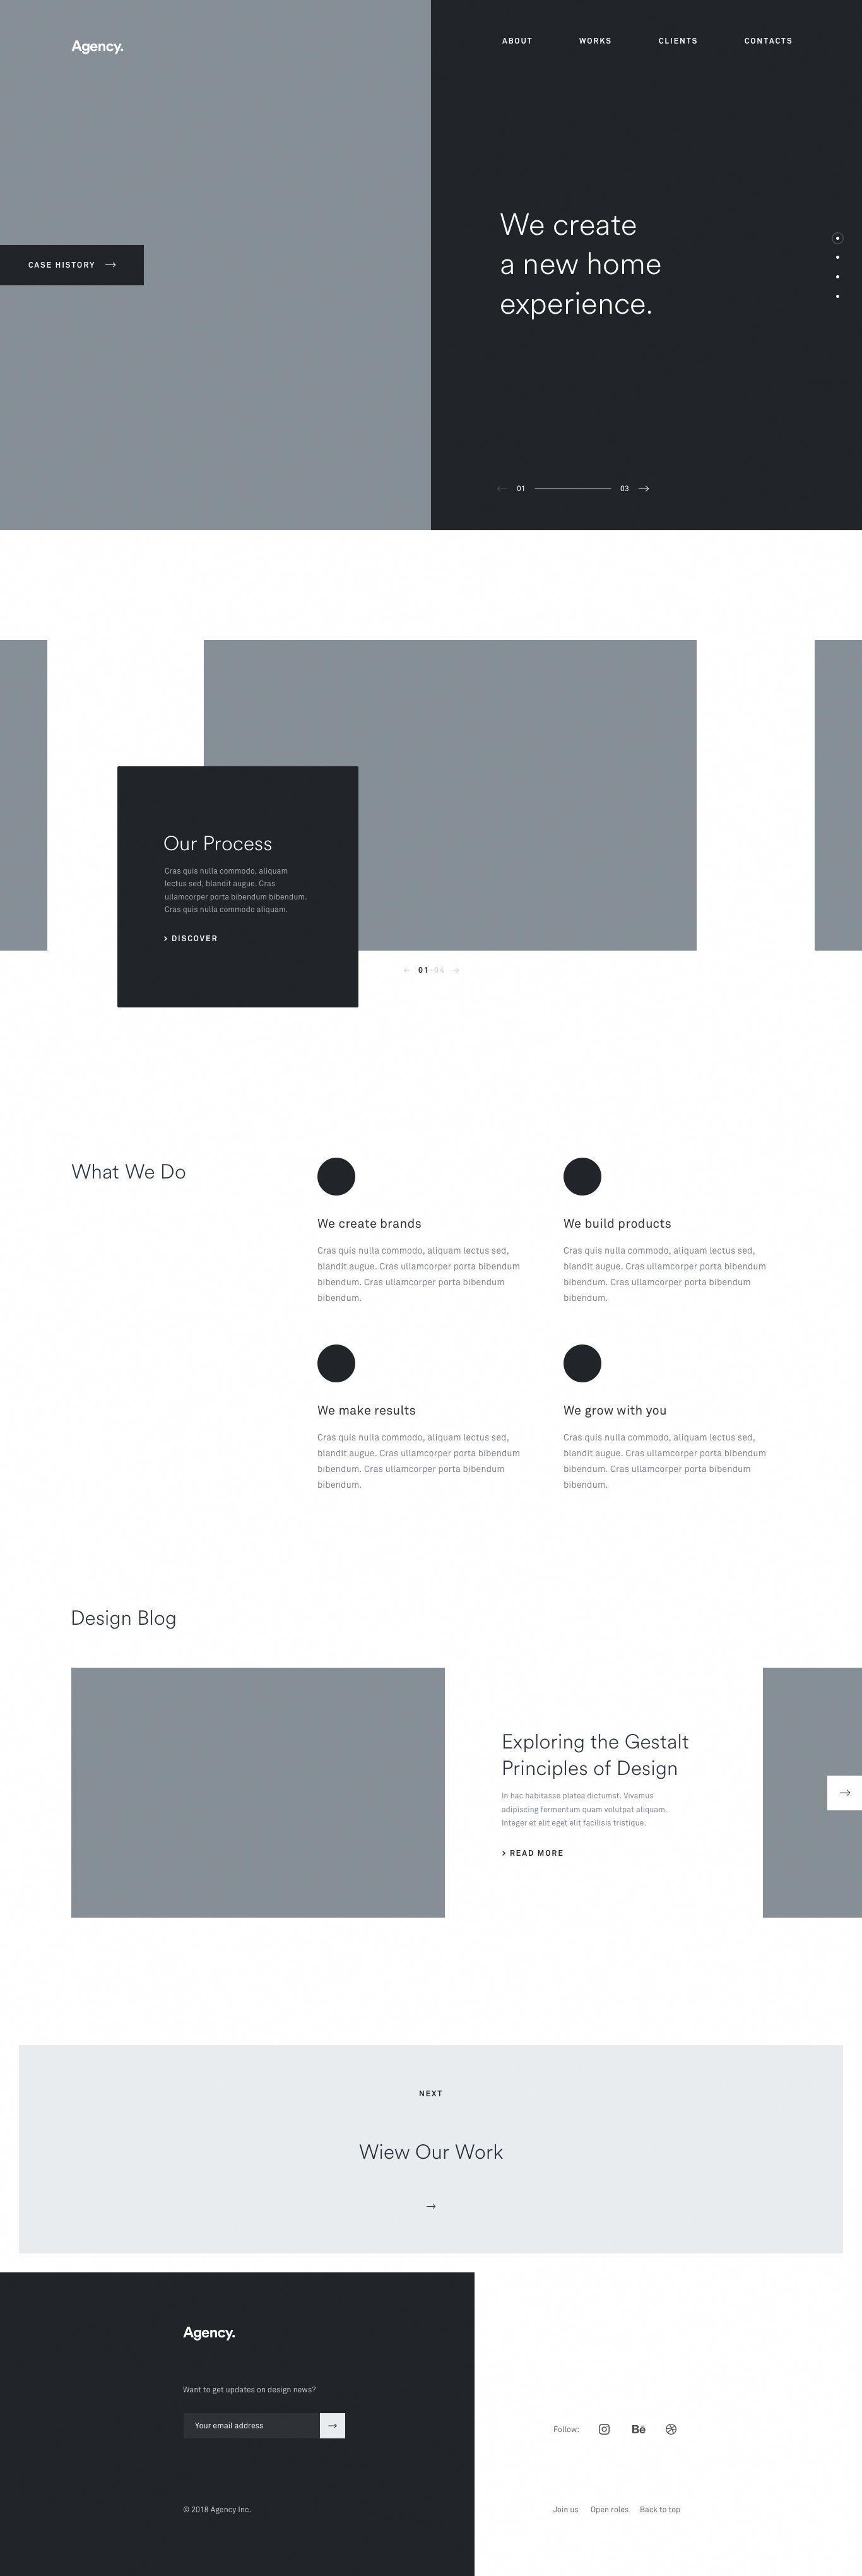 Agency Wireframe Webdesignagency Wireframe Design Web Layout Design Web Design Tips